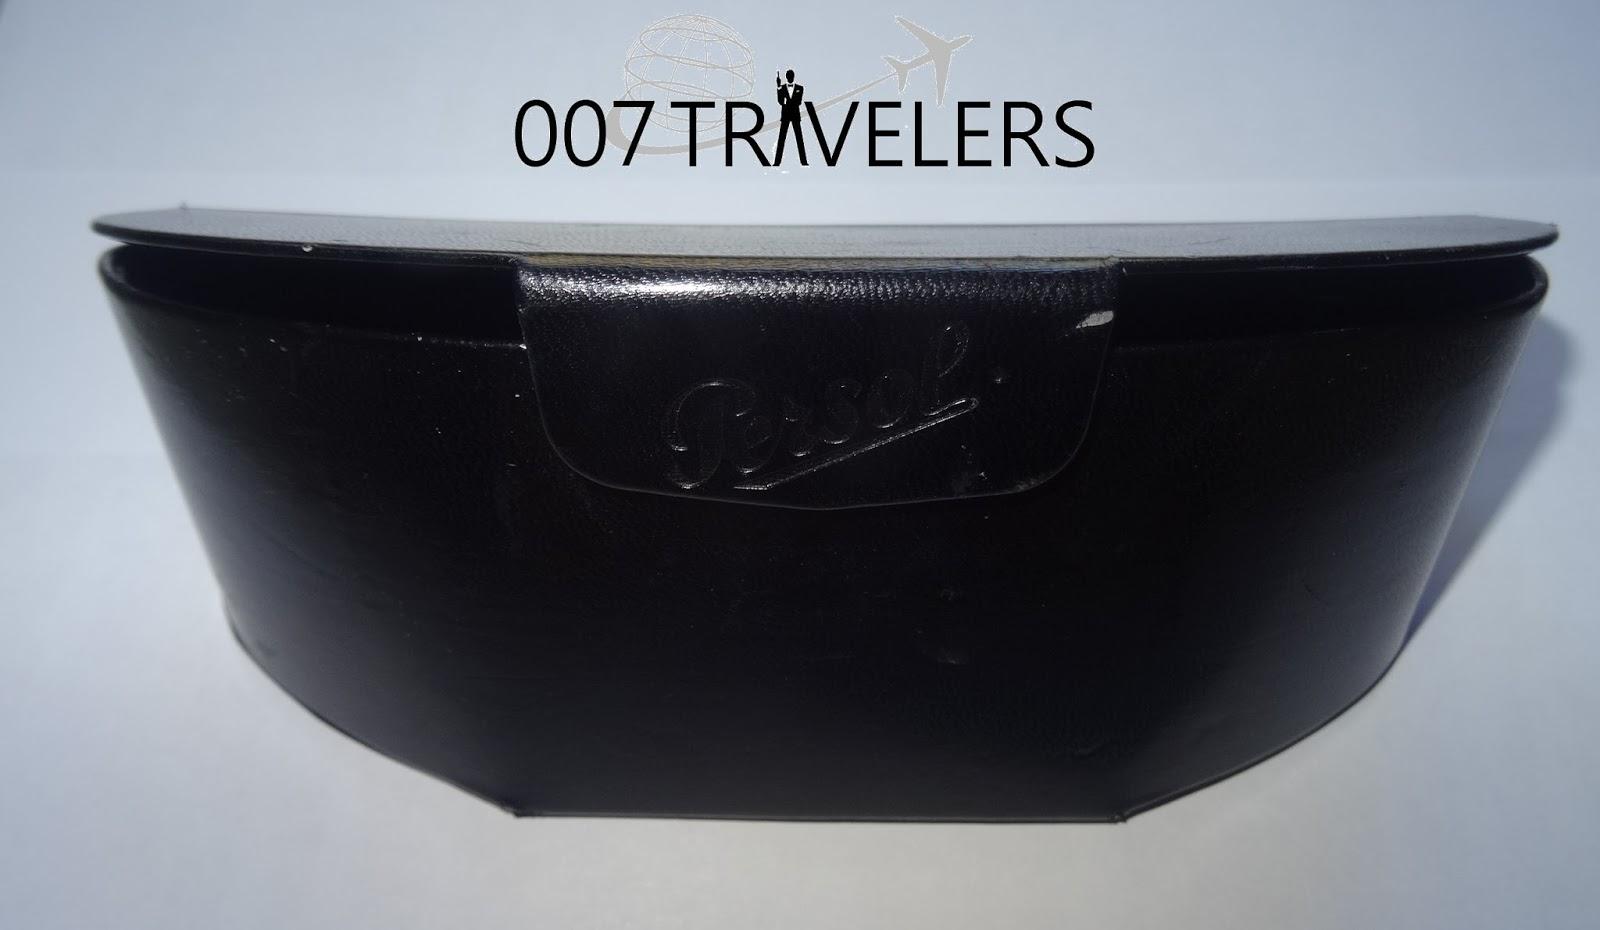 b5a2fa7288c 007 TRAVELERS  007 Item  Persol 2720 sunglasses from